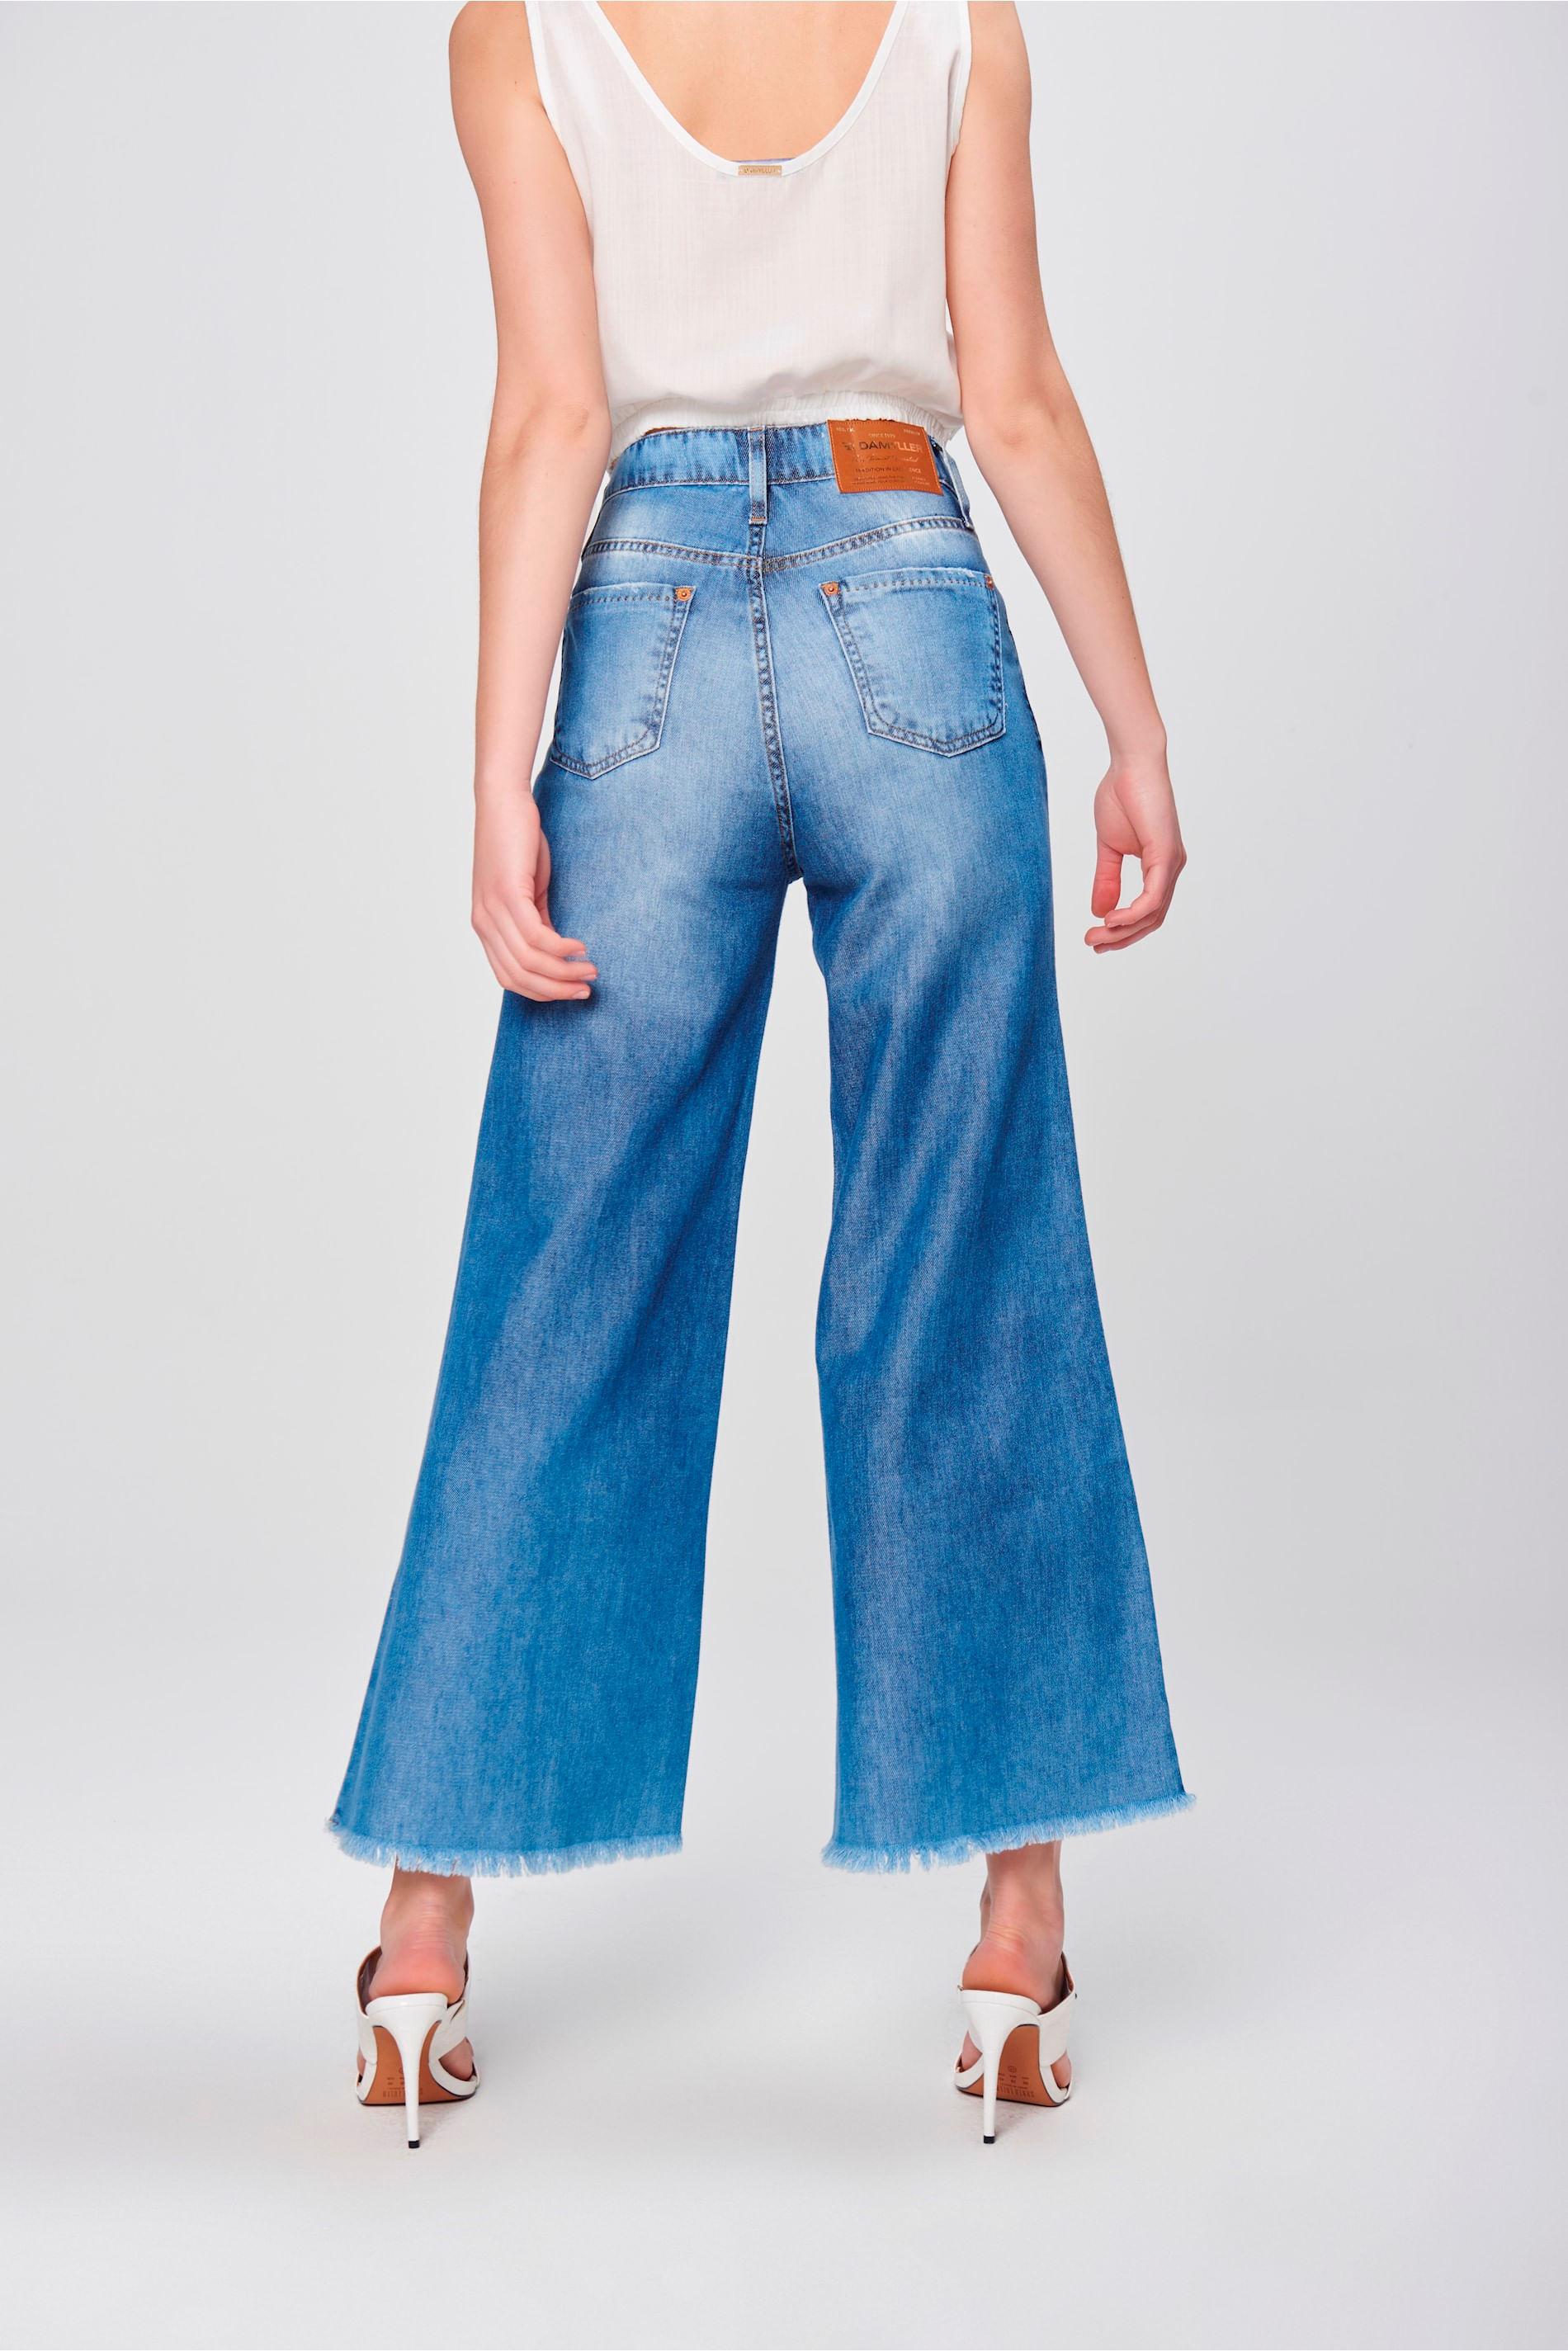 6ee6205a9 Pantalona Jeans Cropped Barra Desfiada - Damyller